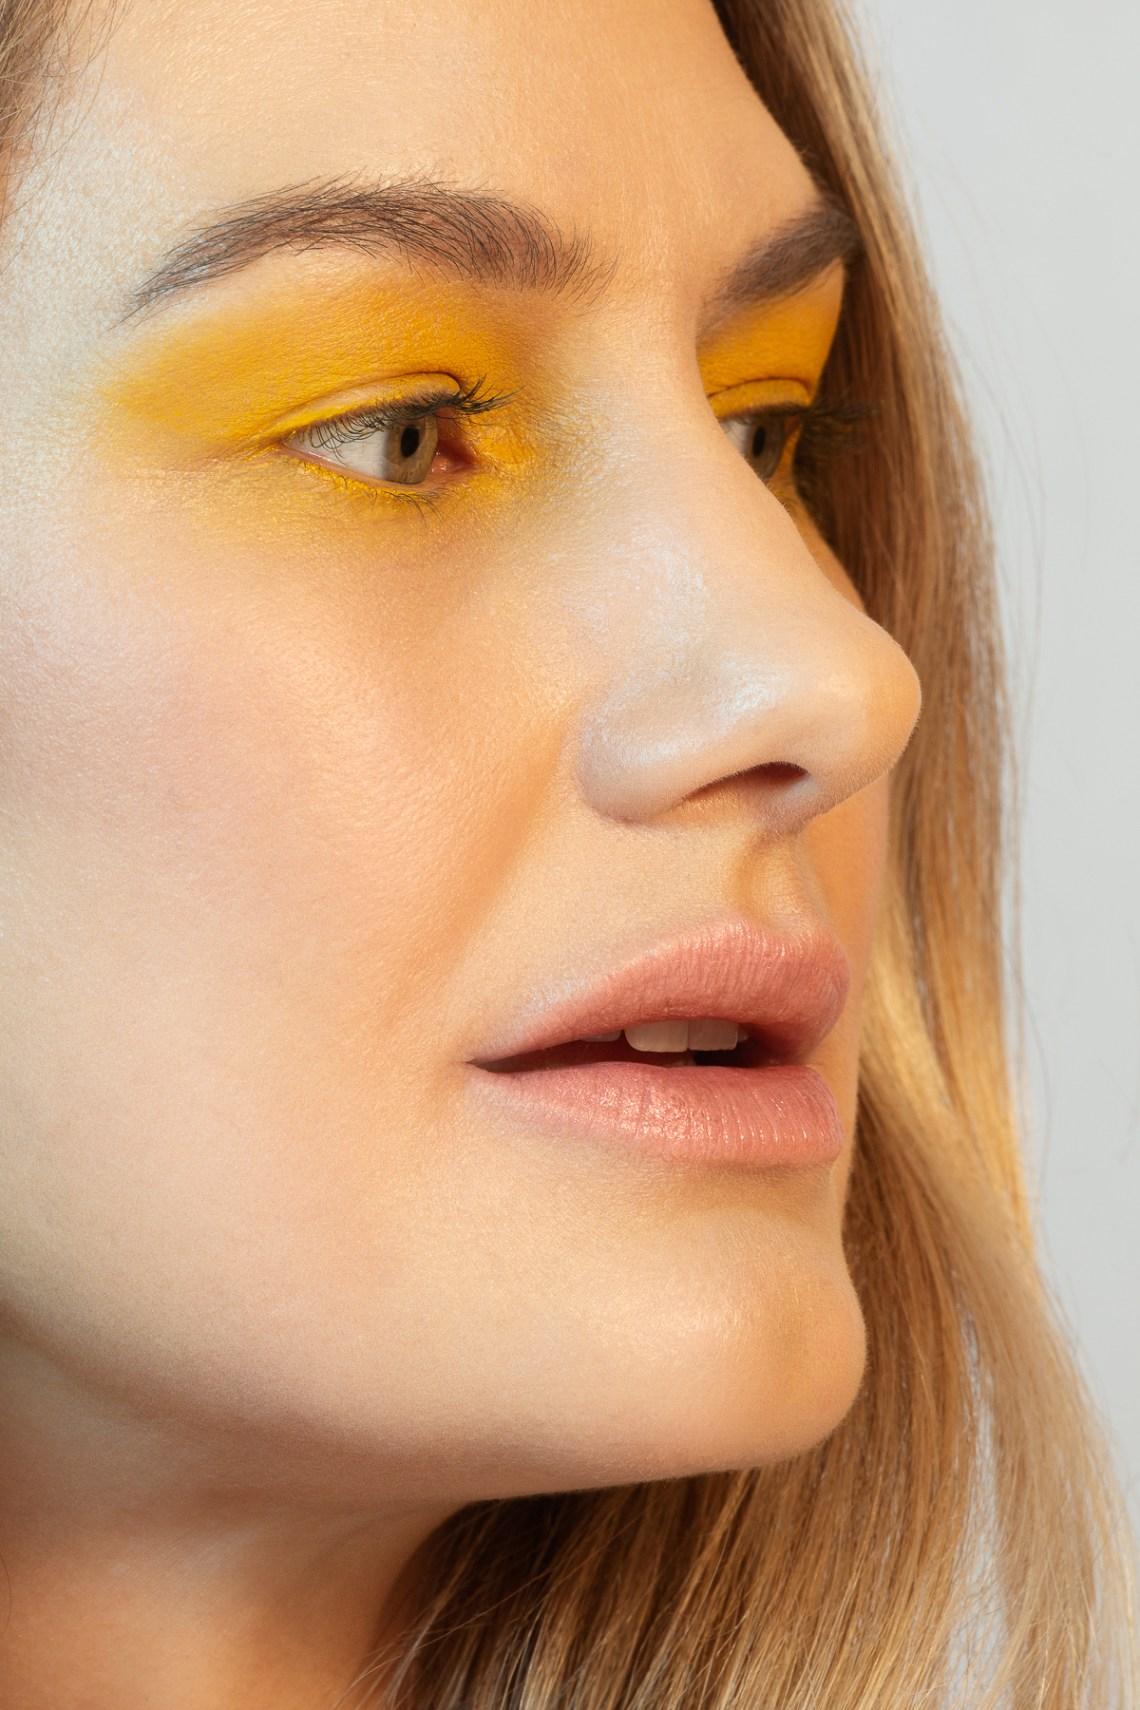 Clean skin beauty portrait photography by Ella Sophie, Oakland CA